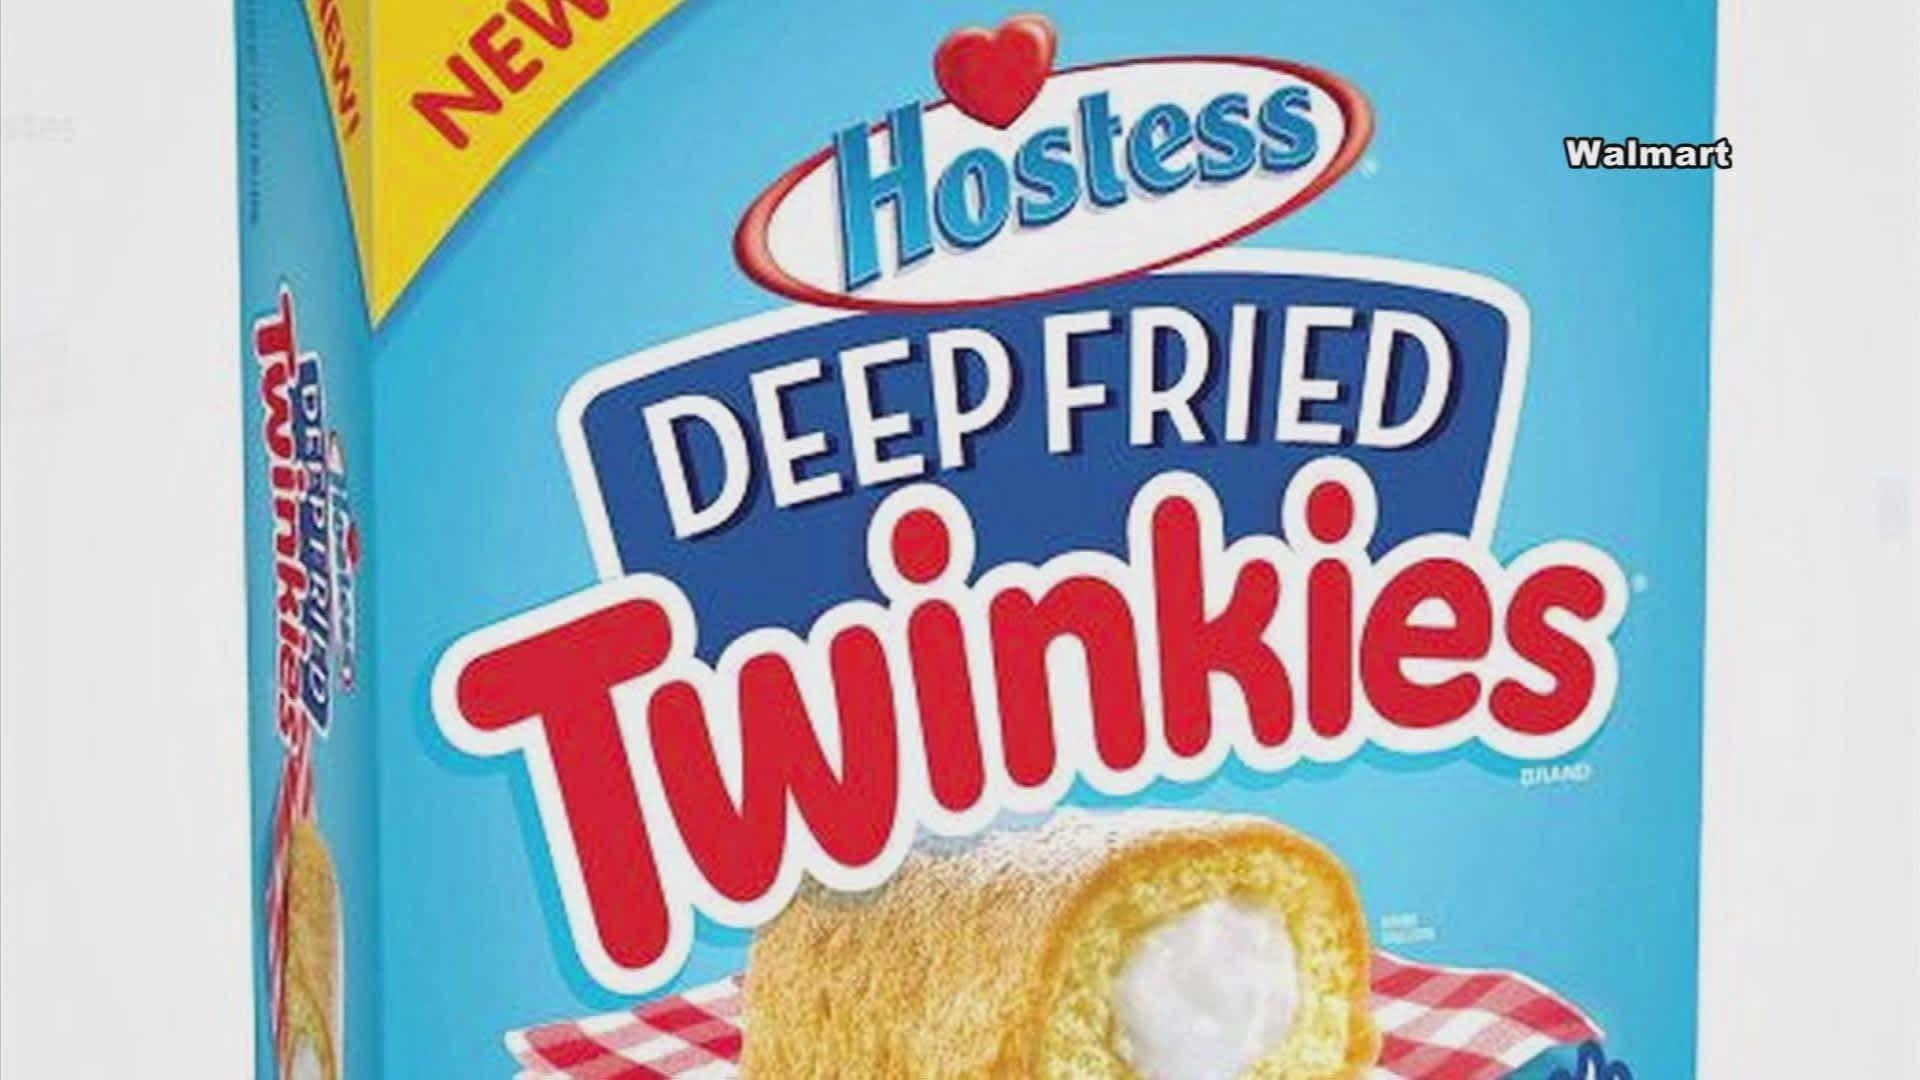 Hostess launches \'deep fried Twinkies\' as first frozen treat